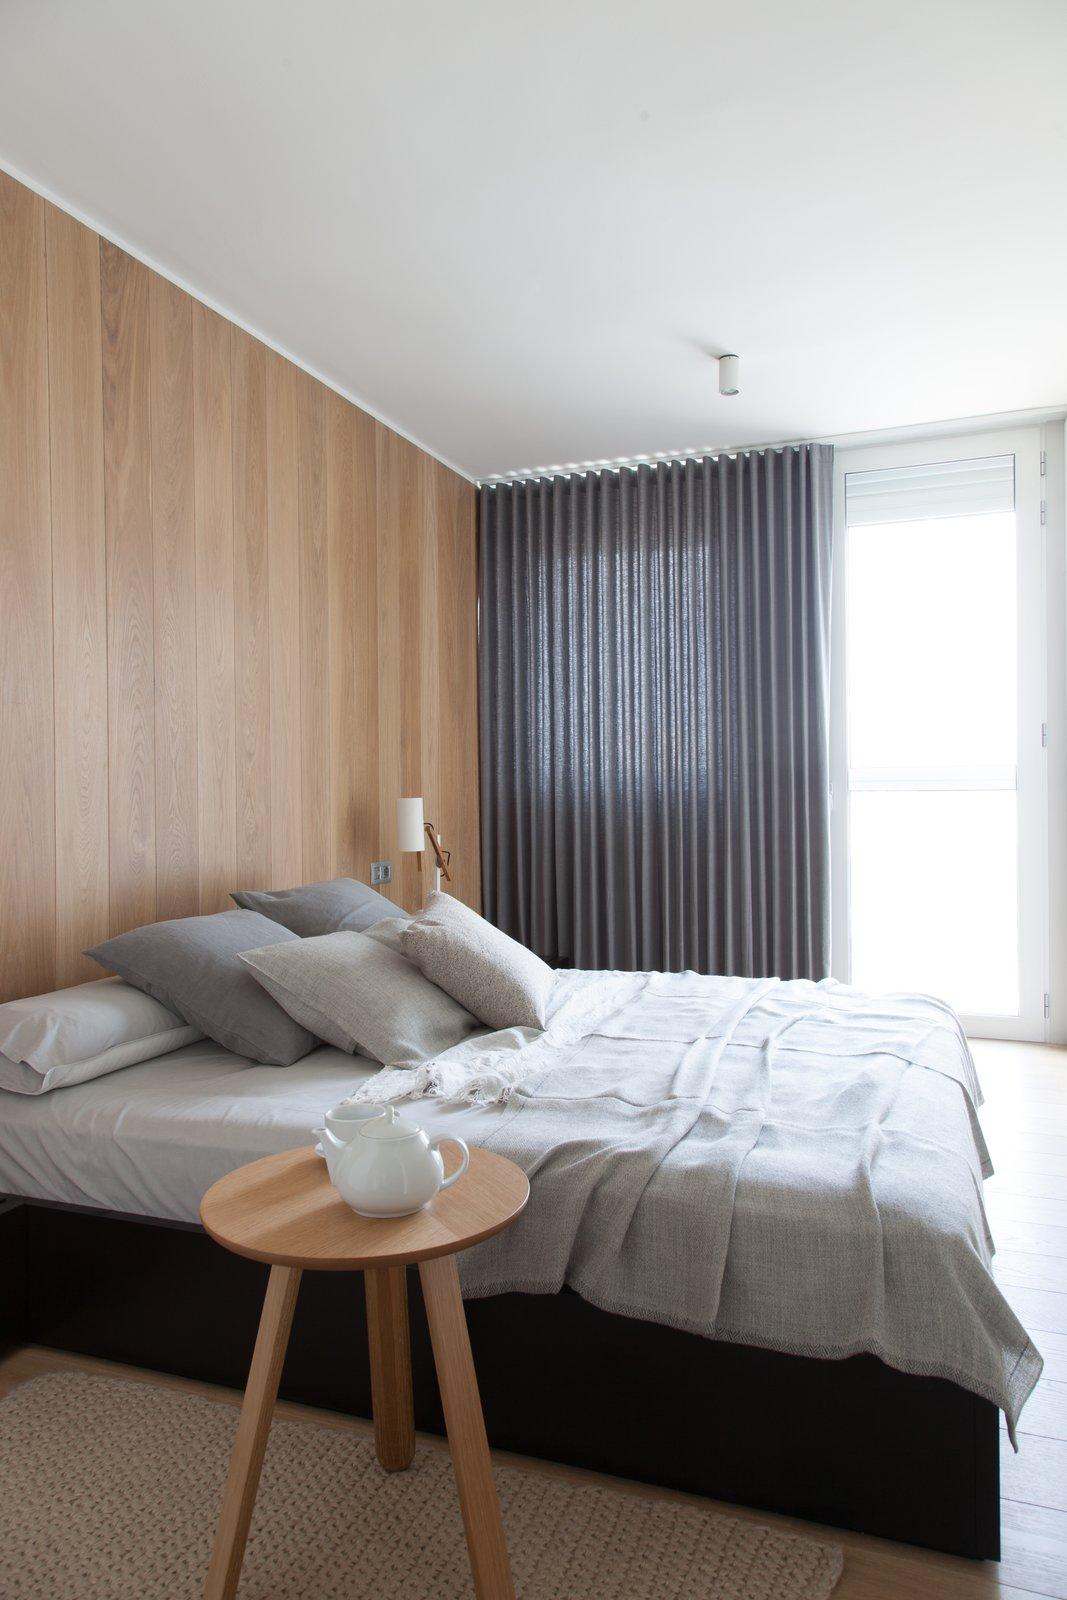 #bedroom #modern #architecture #modernarchitecture #bed #minimal #linen #renovation #Barcelona #Spain #YLABArquitectosBarcelona